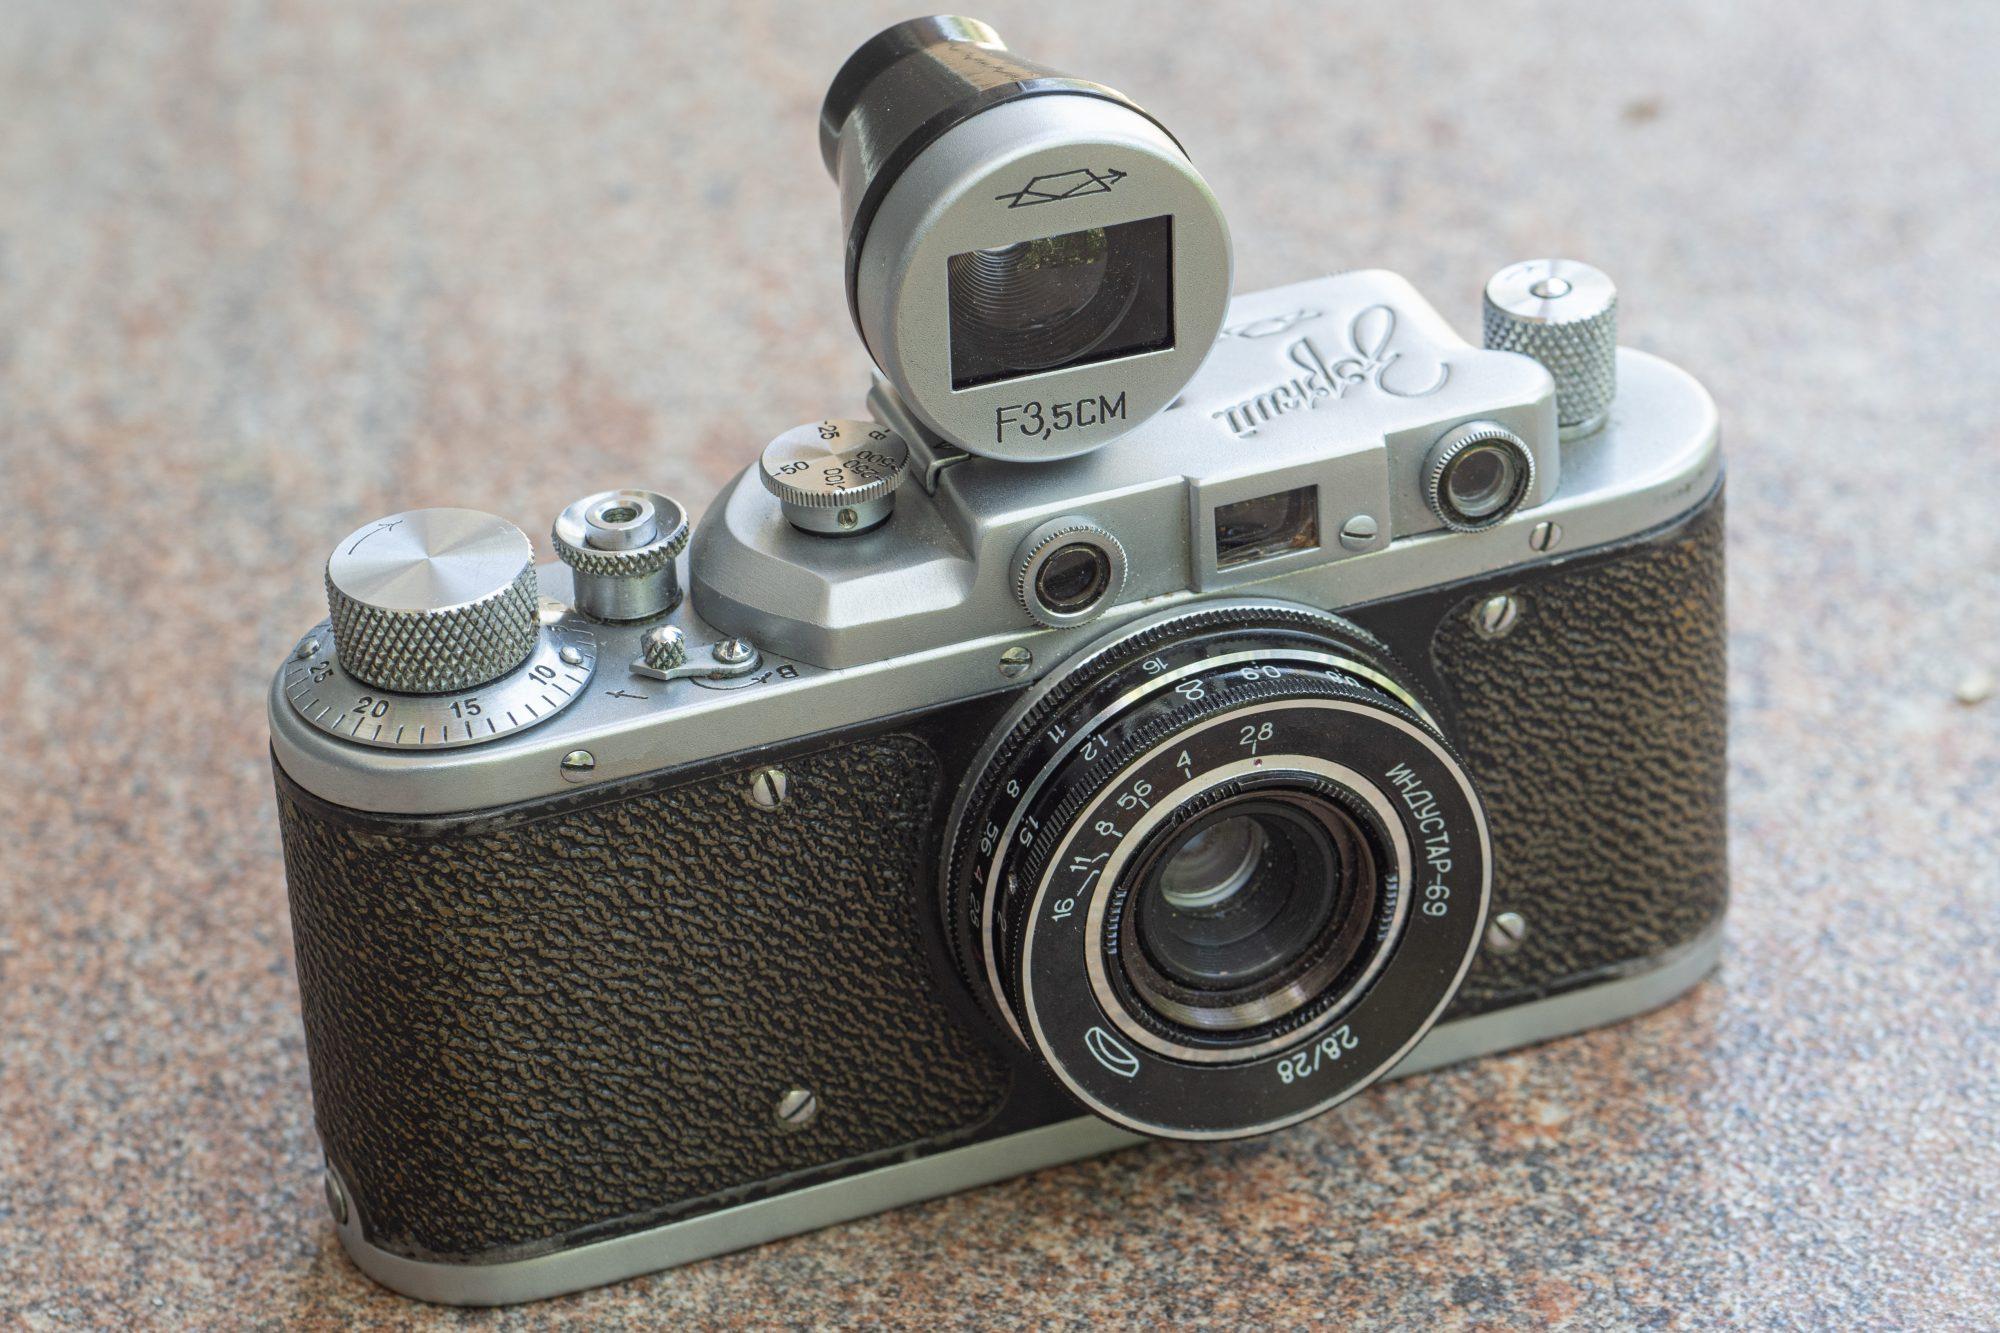 Zorki 1 with Industar-69 lens (Pic: Andrey Khludeyev)